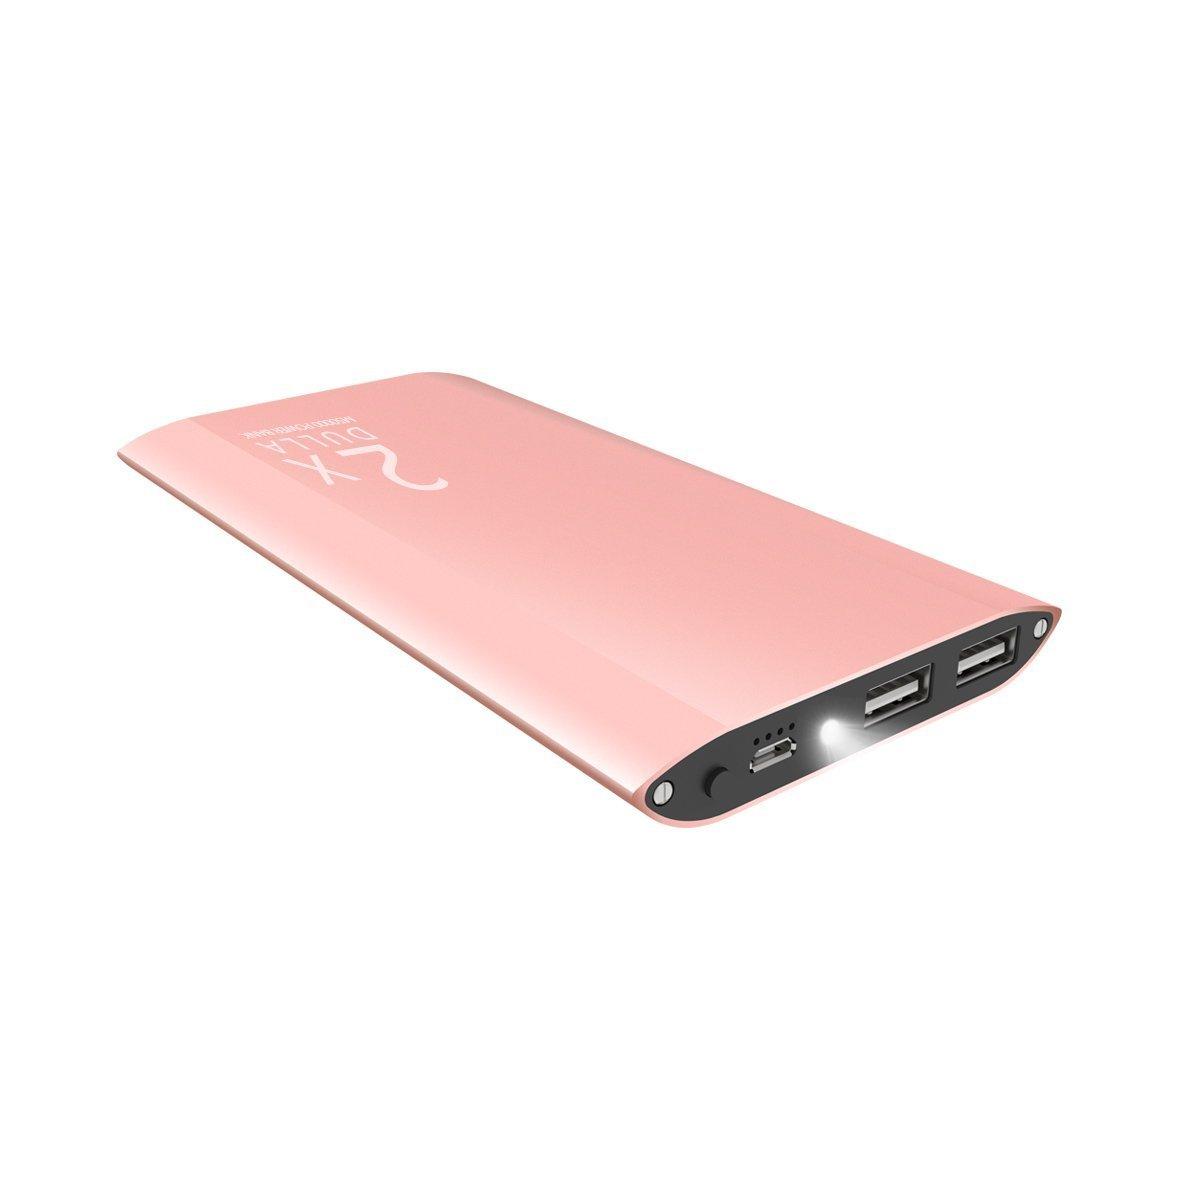 DULLA M50000 Portable Power Bank 12000mAh External Battery Charger